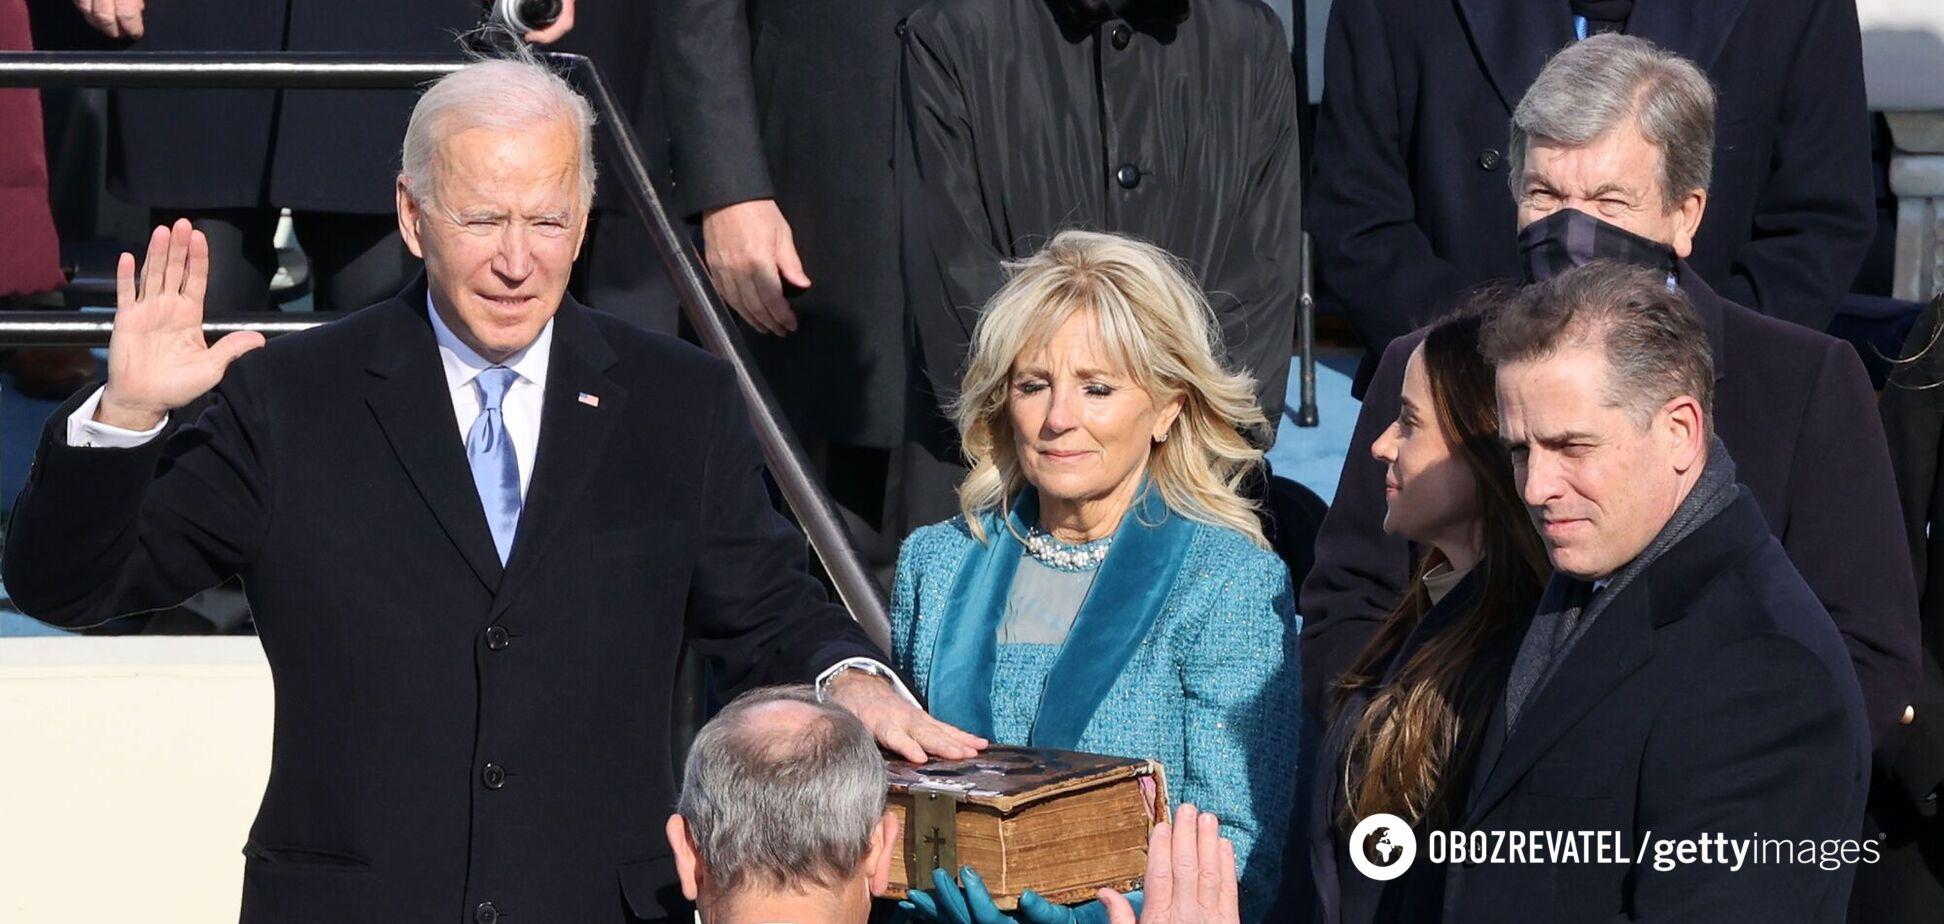 Байден стал 46-м президентом США